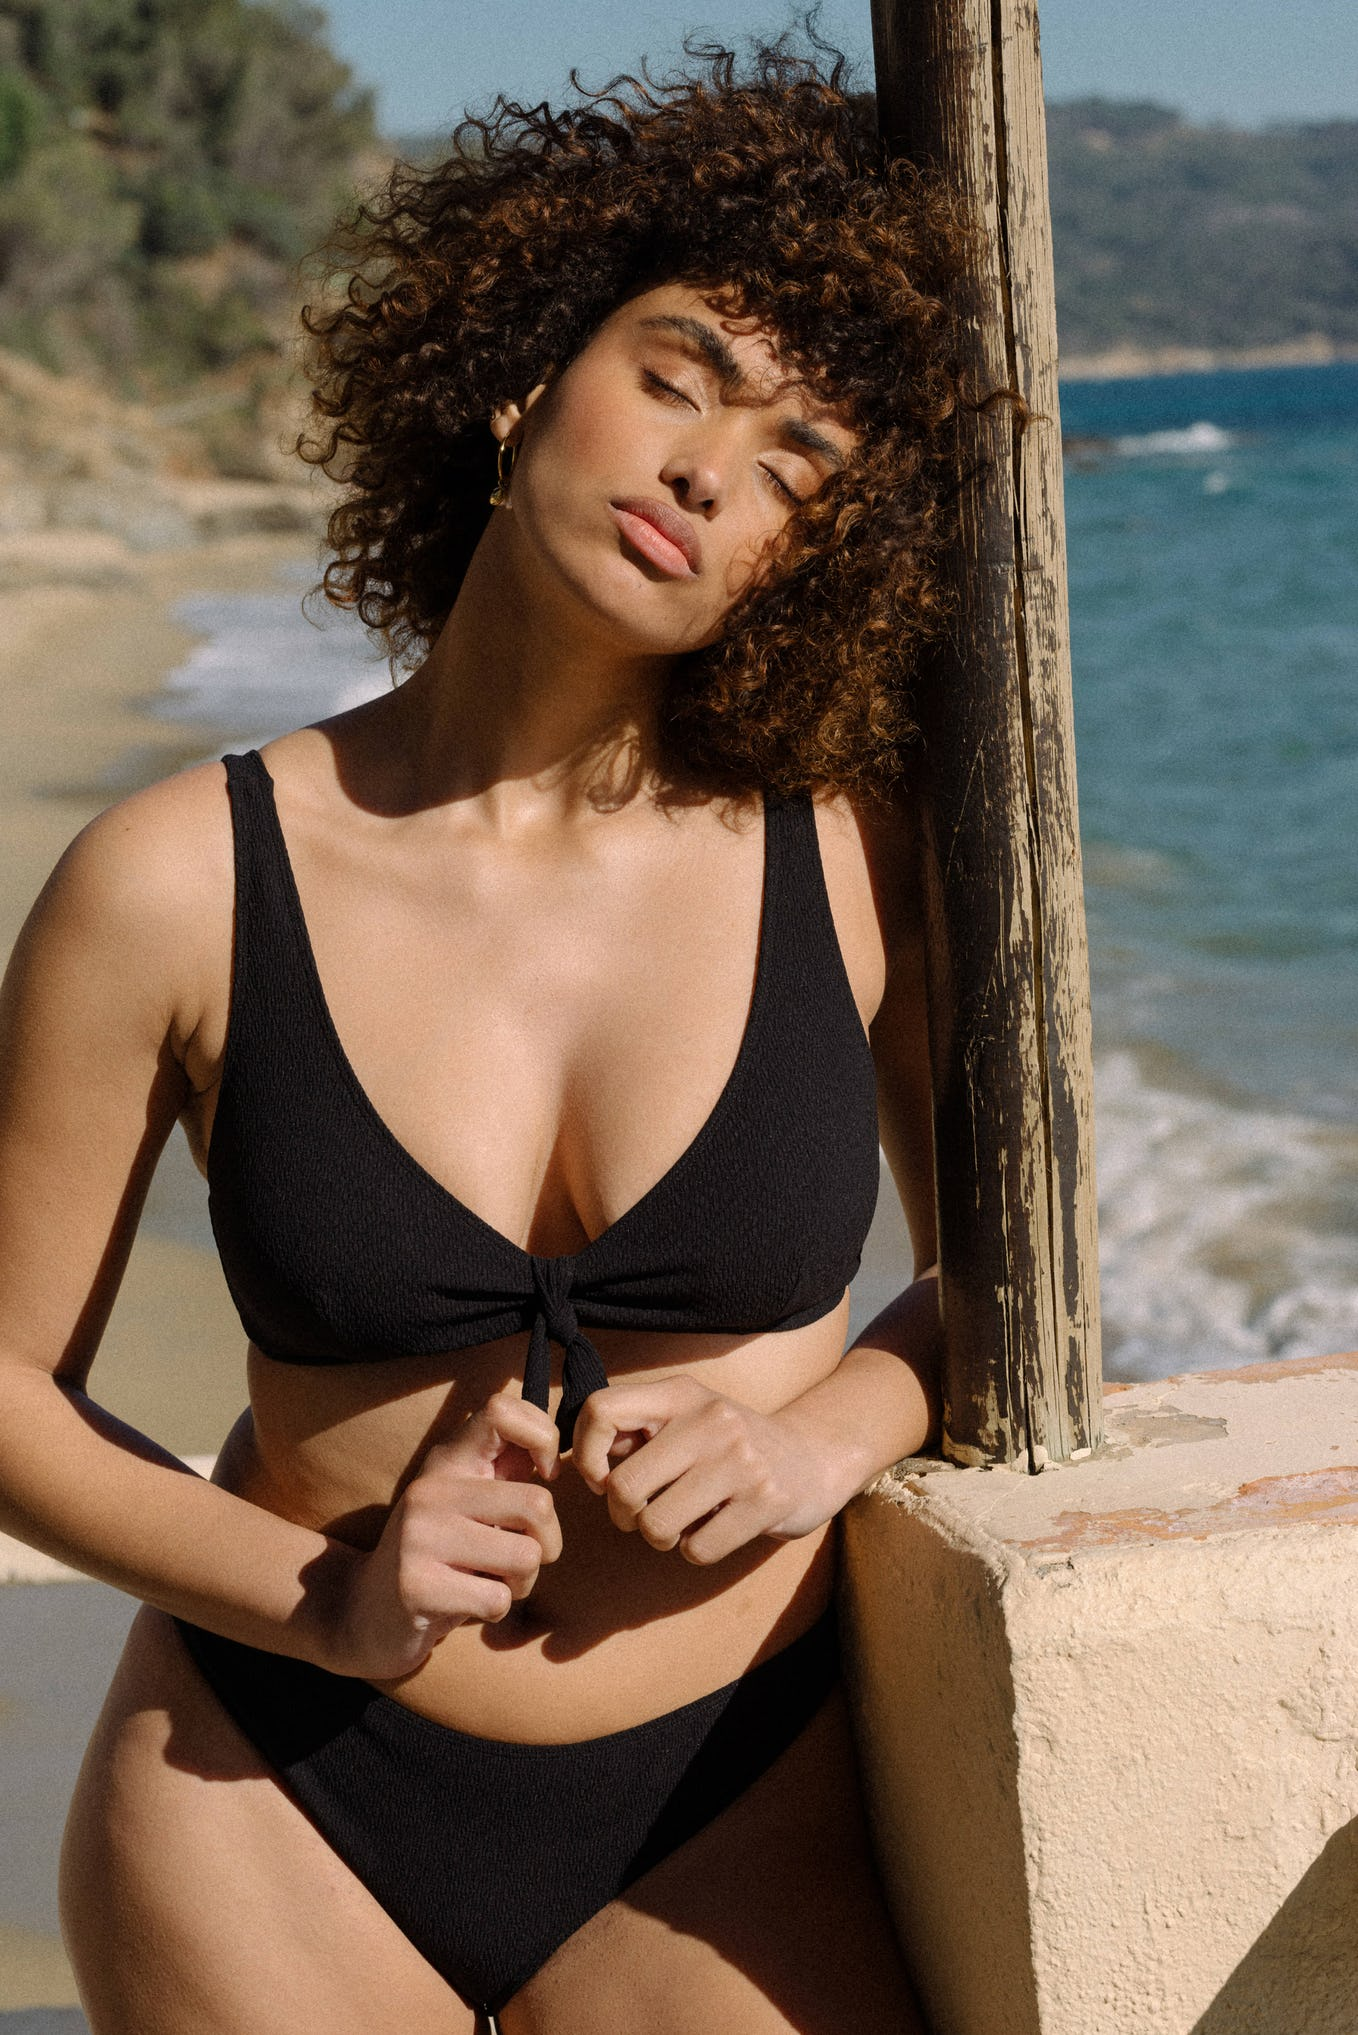 Swimsuit Beauté insulaire in Black